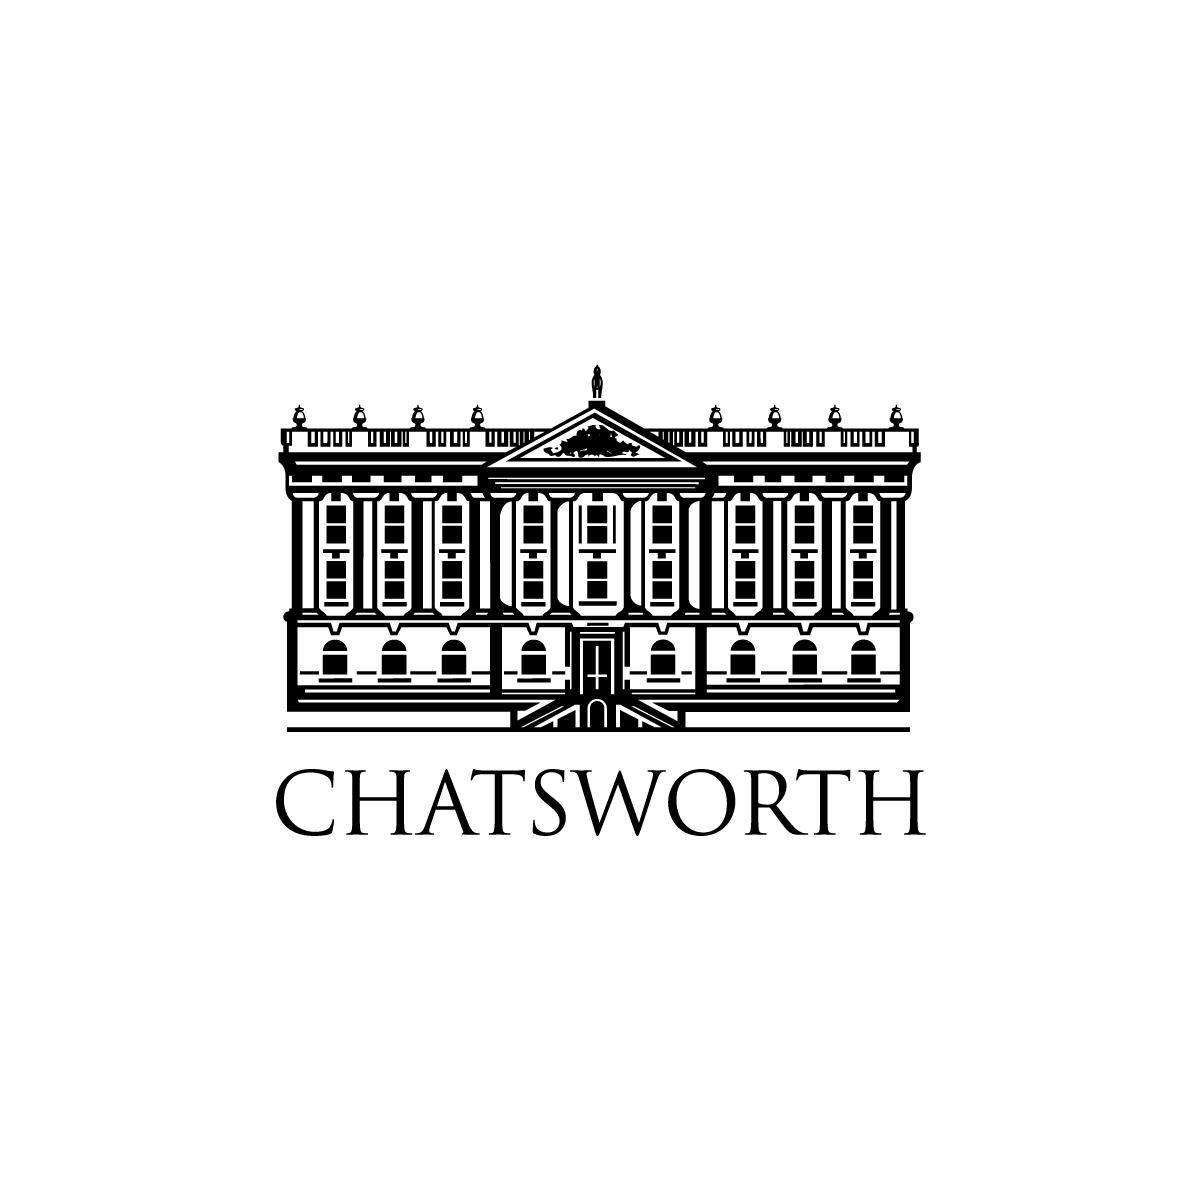 chatsworth-logo.png